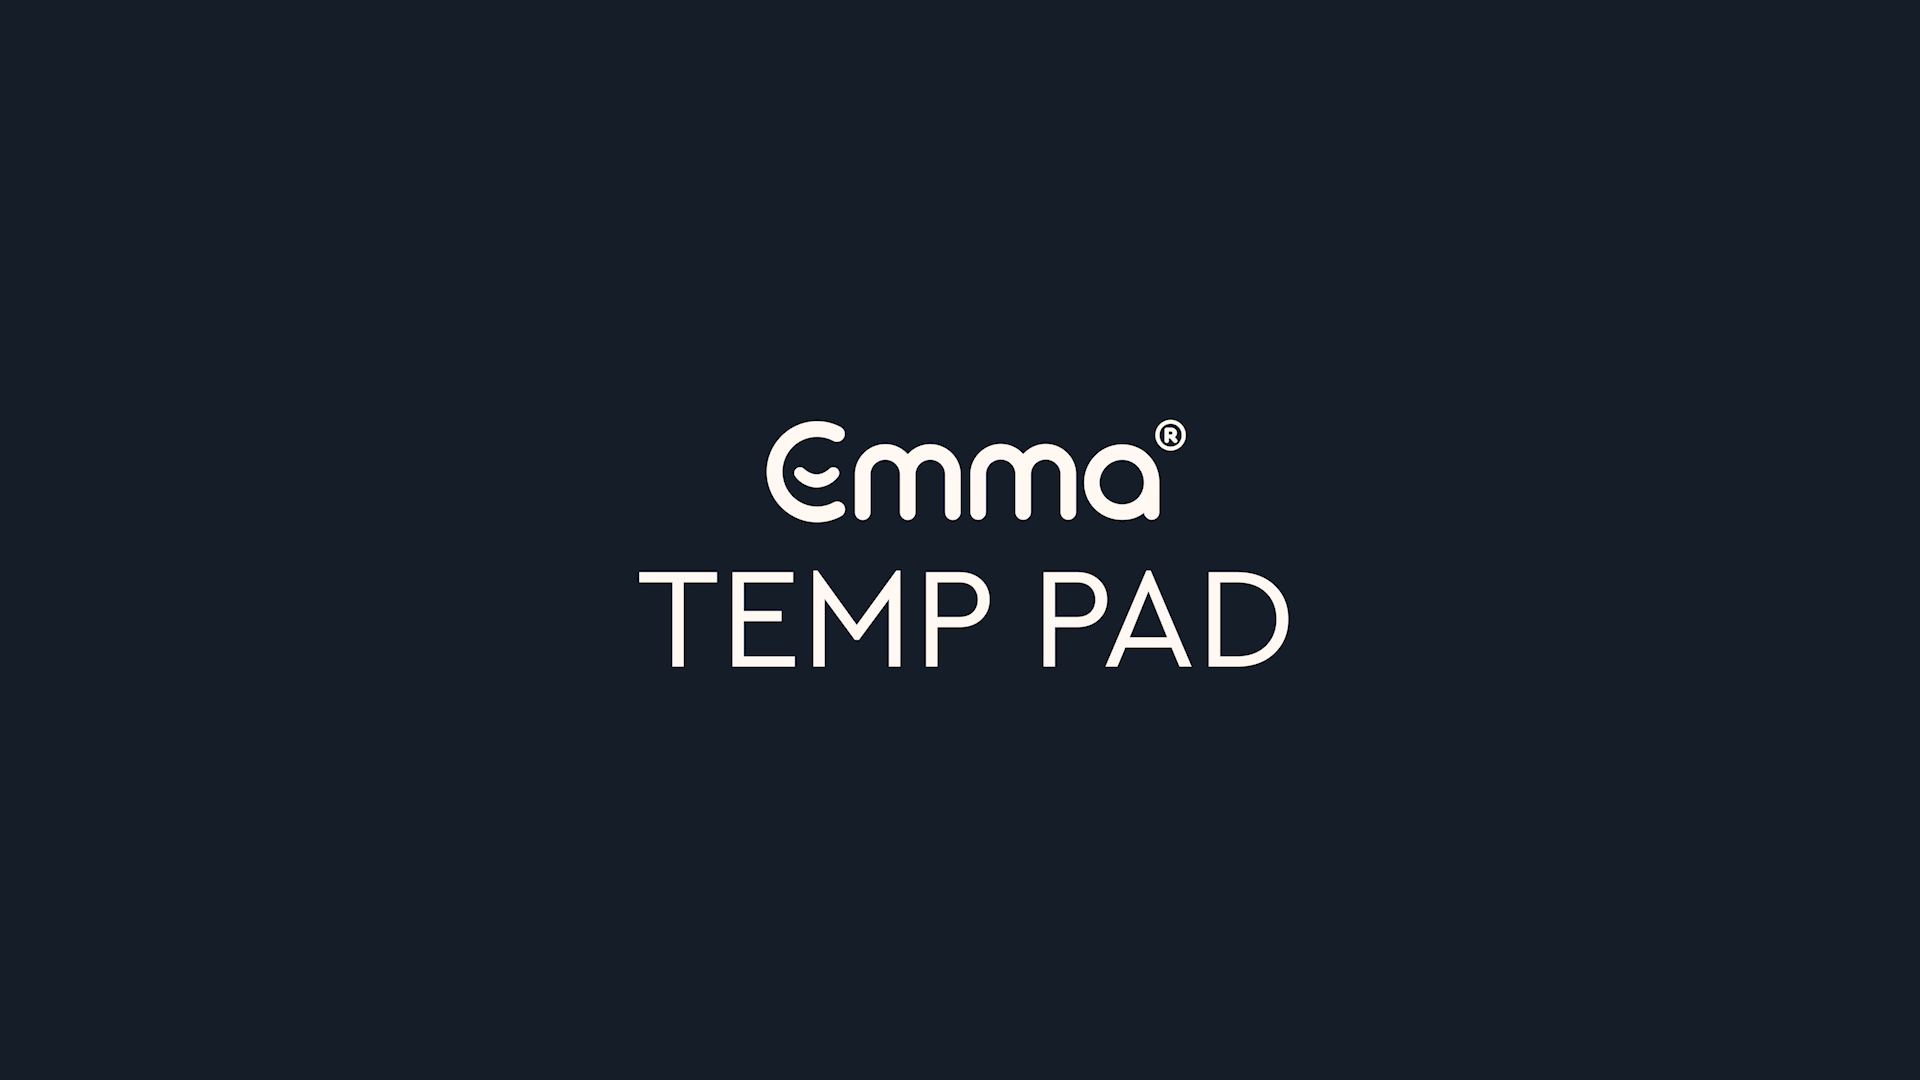 Emma Temp Pad